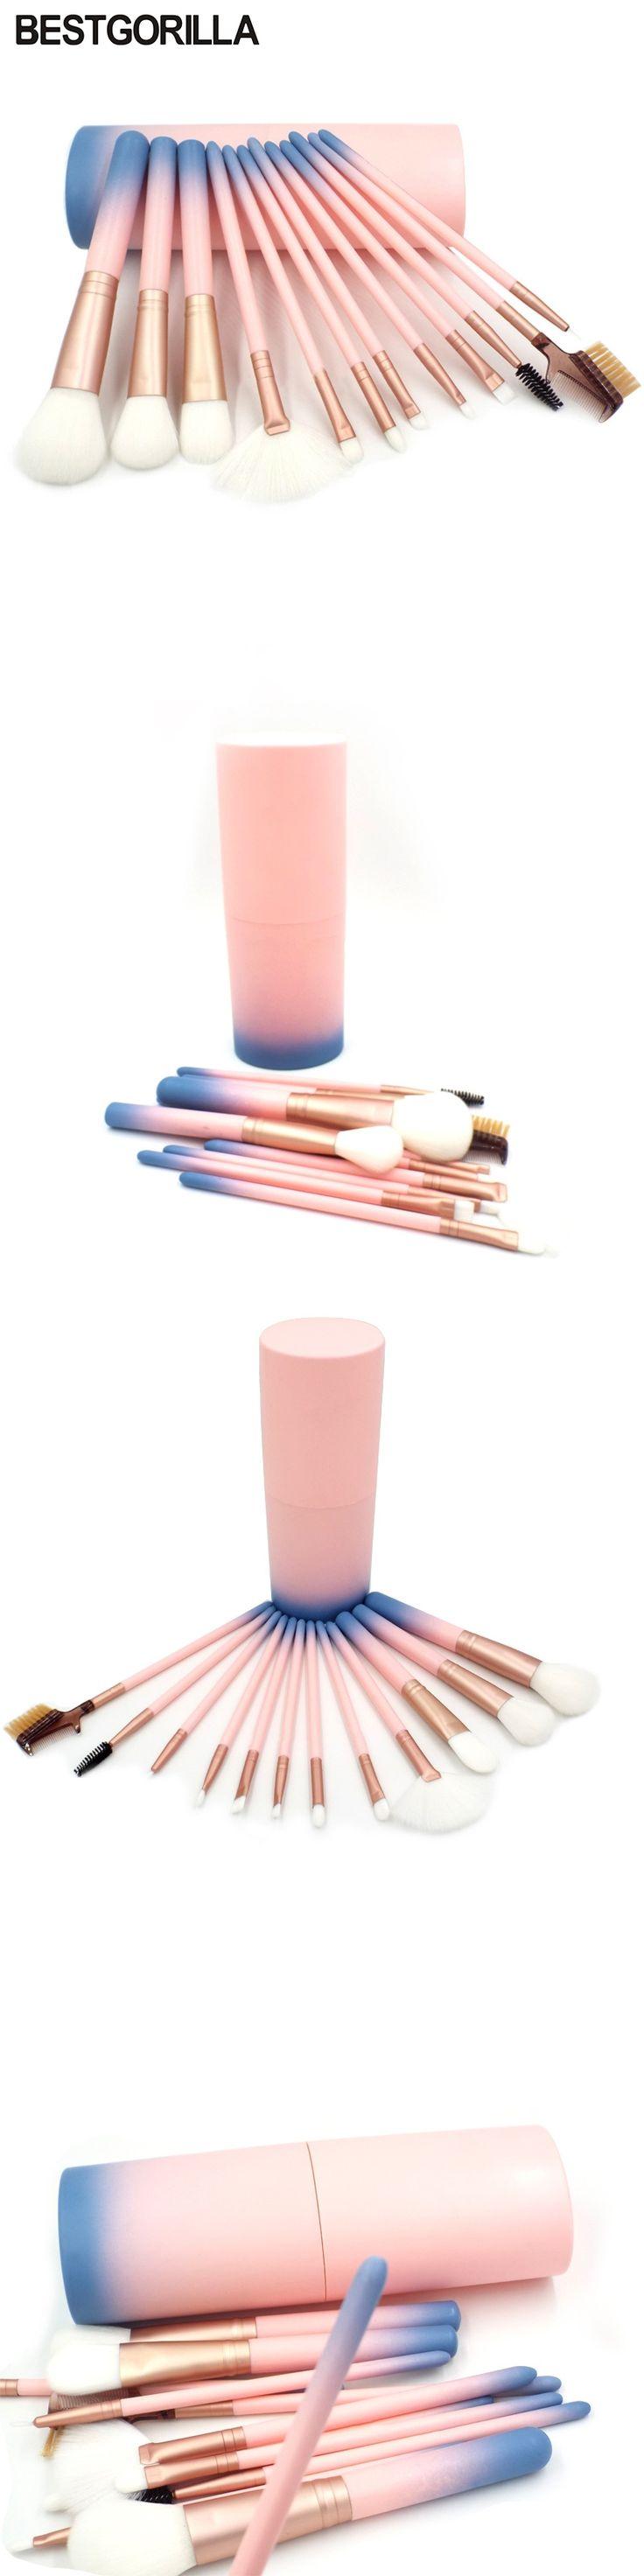 BESTGORILLA best Professional 12pcs makeup brush  Beauty tools 12 makeup brush Sets Cylinder Gradient handle with eyebrow brush